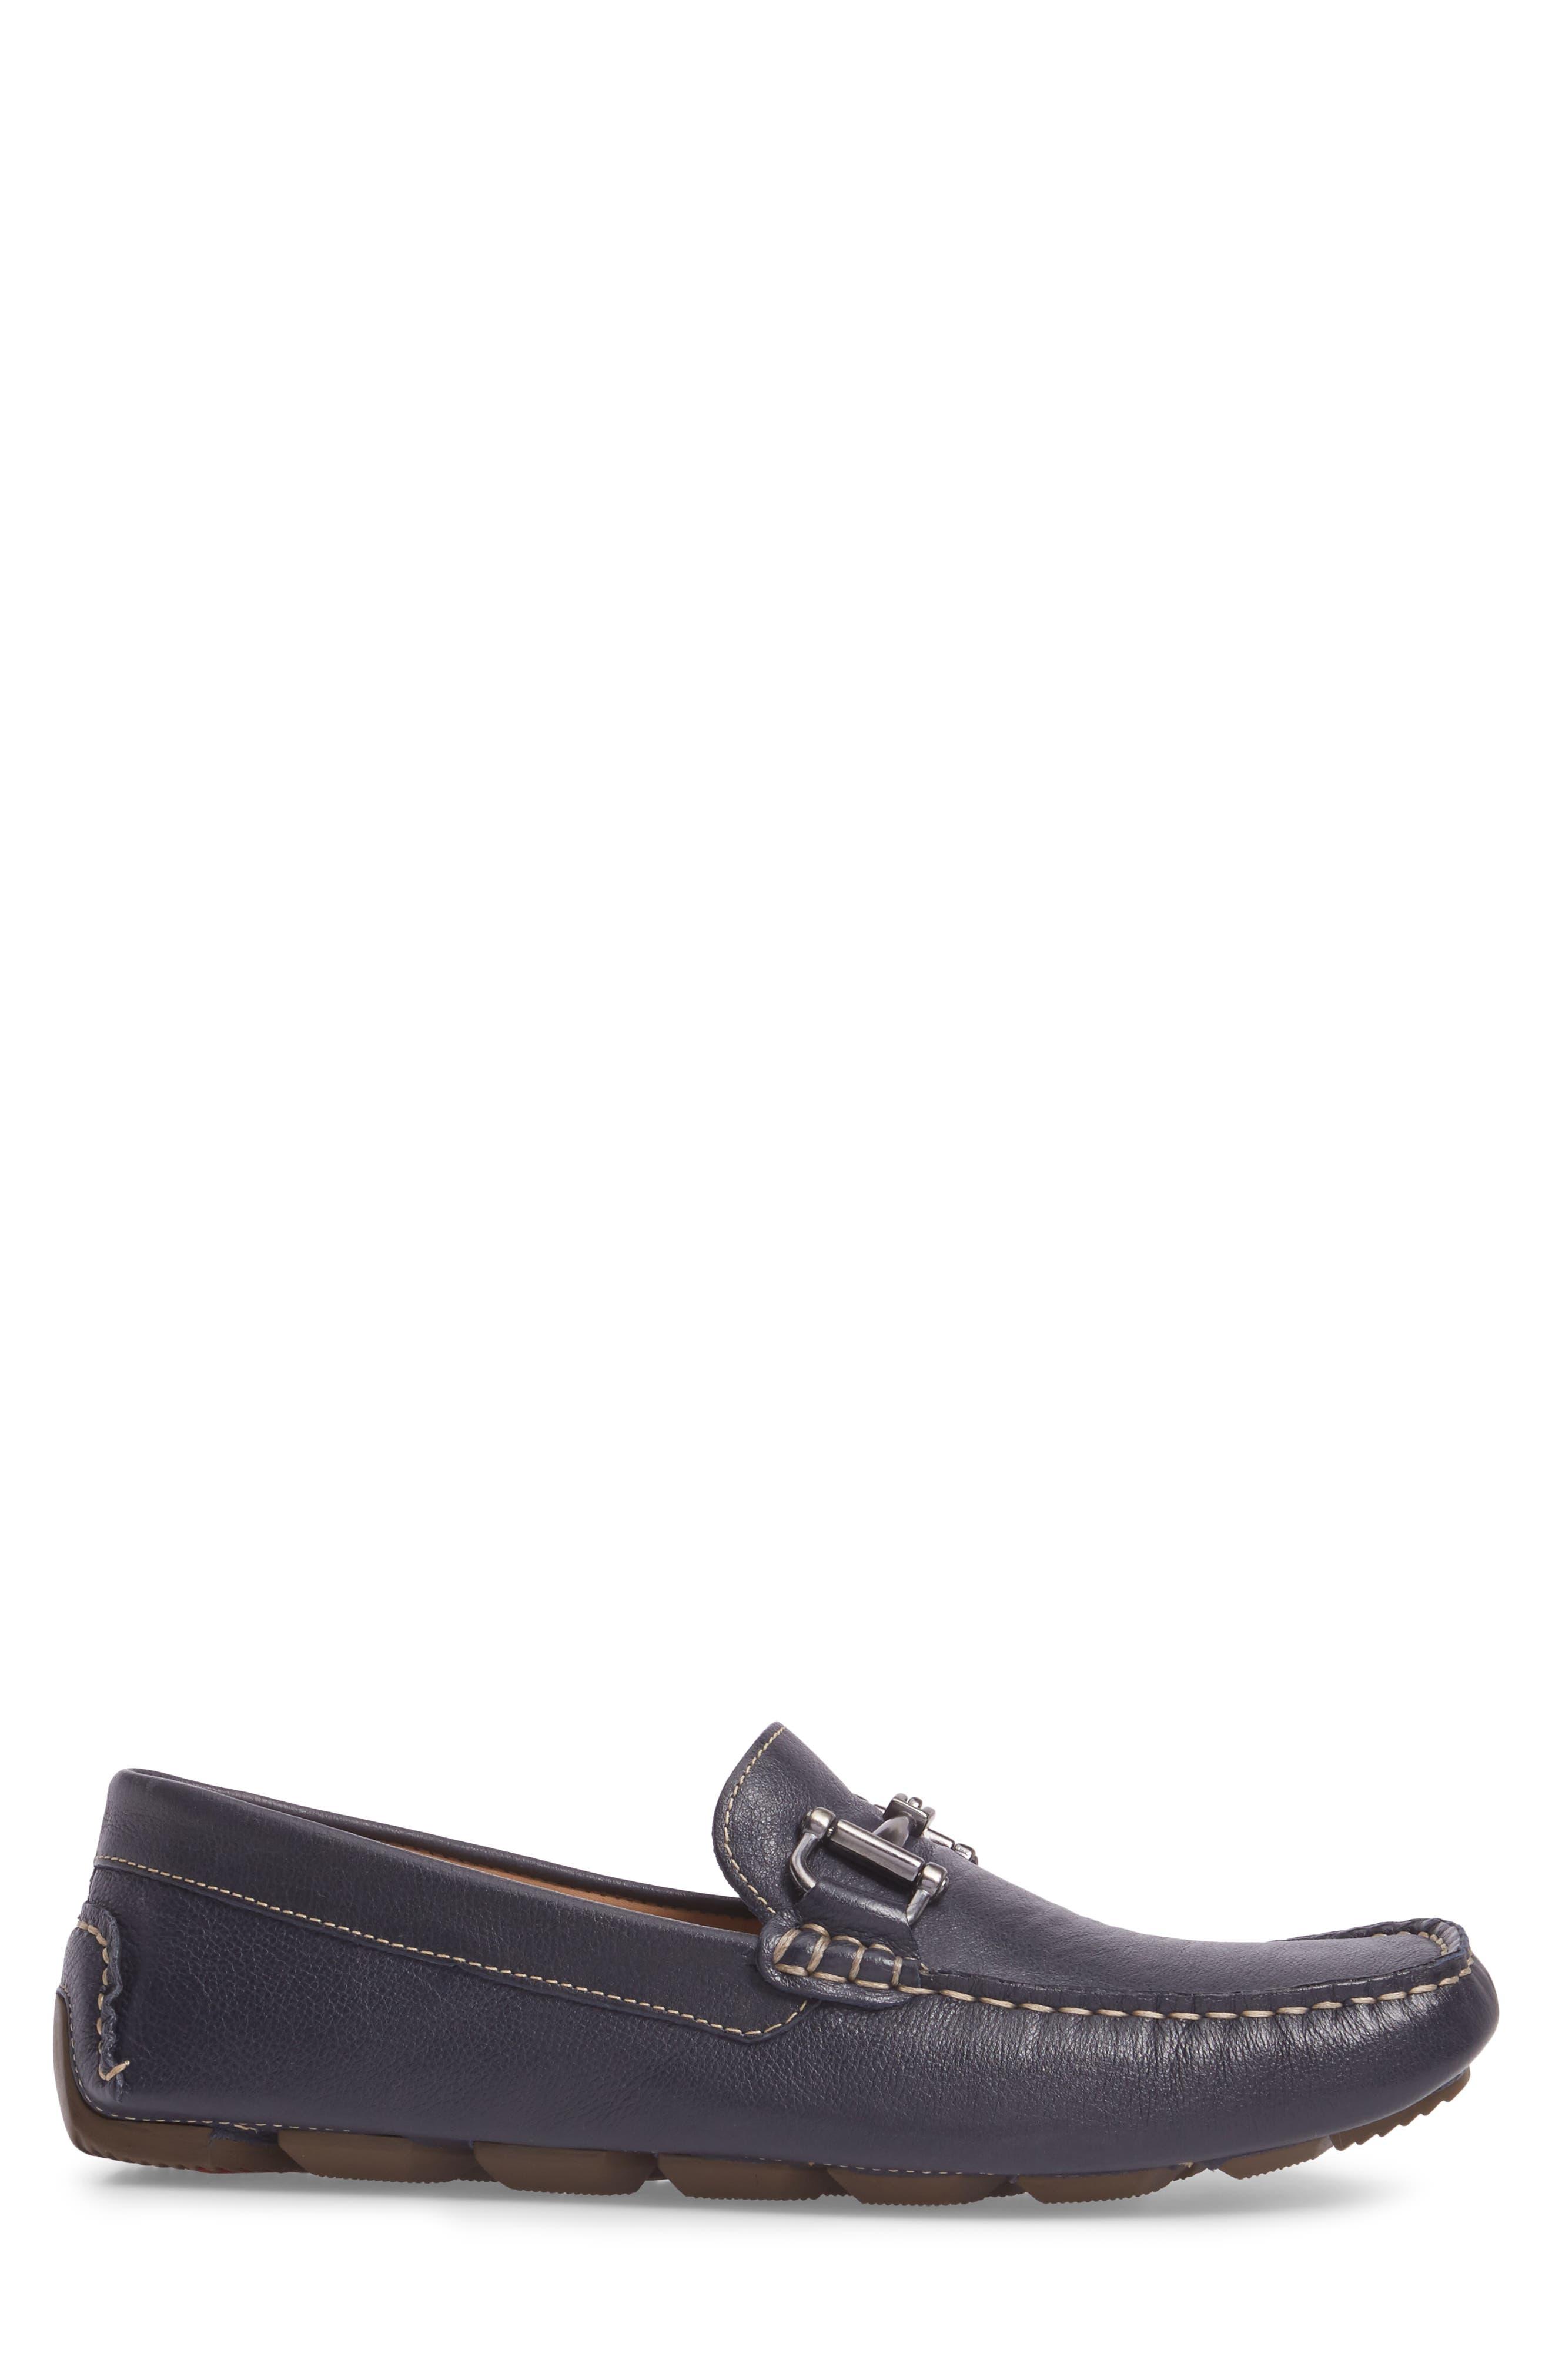 Topanga Driving Shoe,                             Alternate thumbnail 3, color,                             Navy Leather